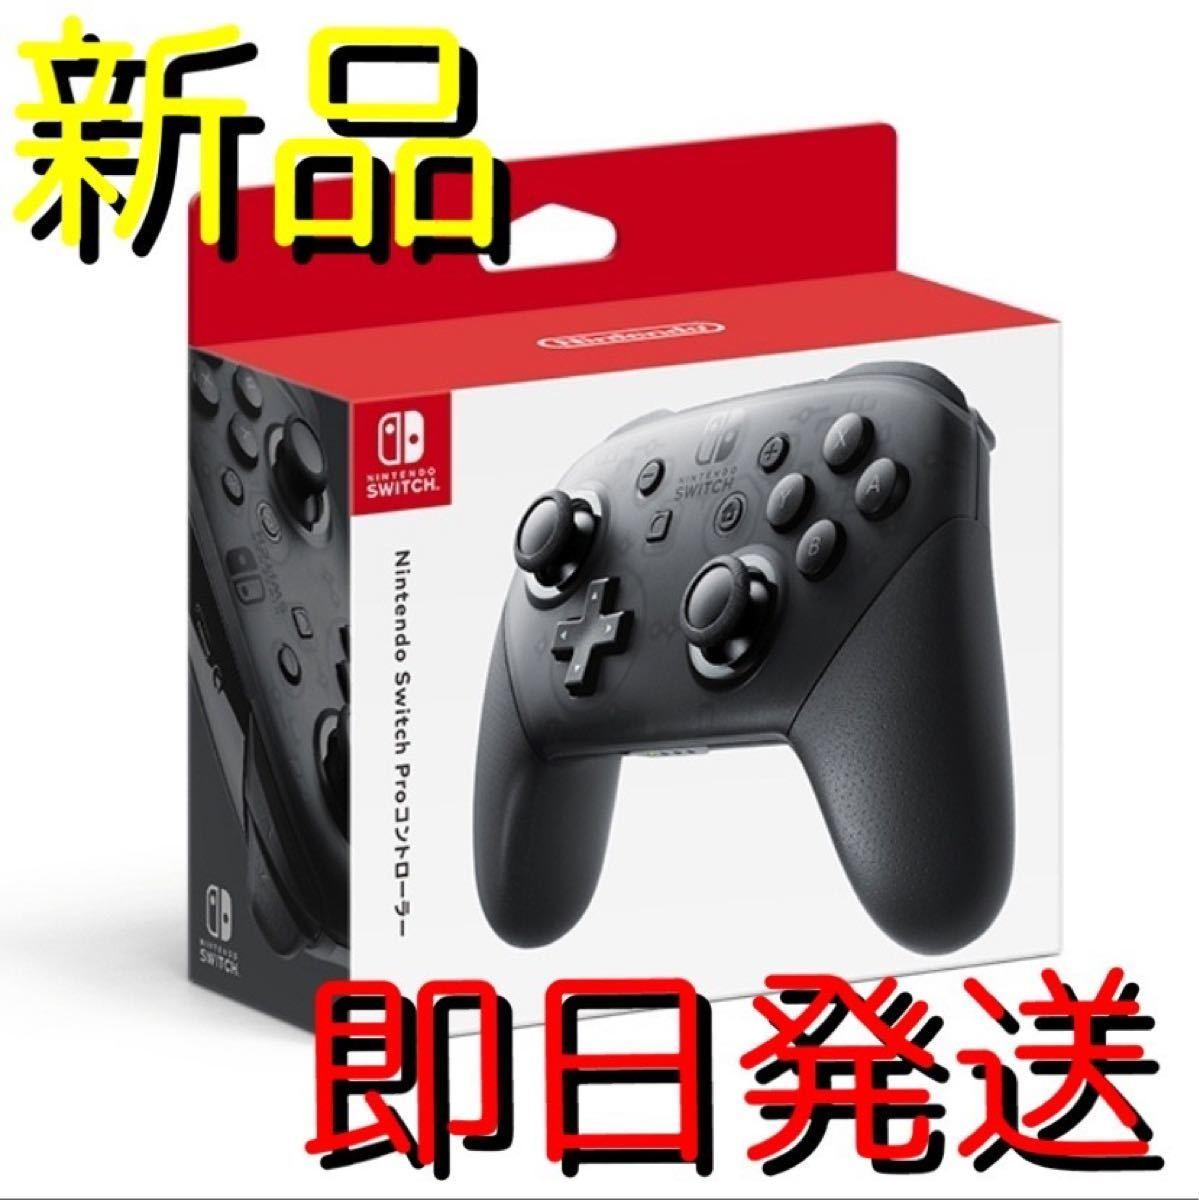 Nintendo NINTENDO SWITCH PROコントローラー 0002